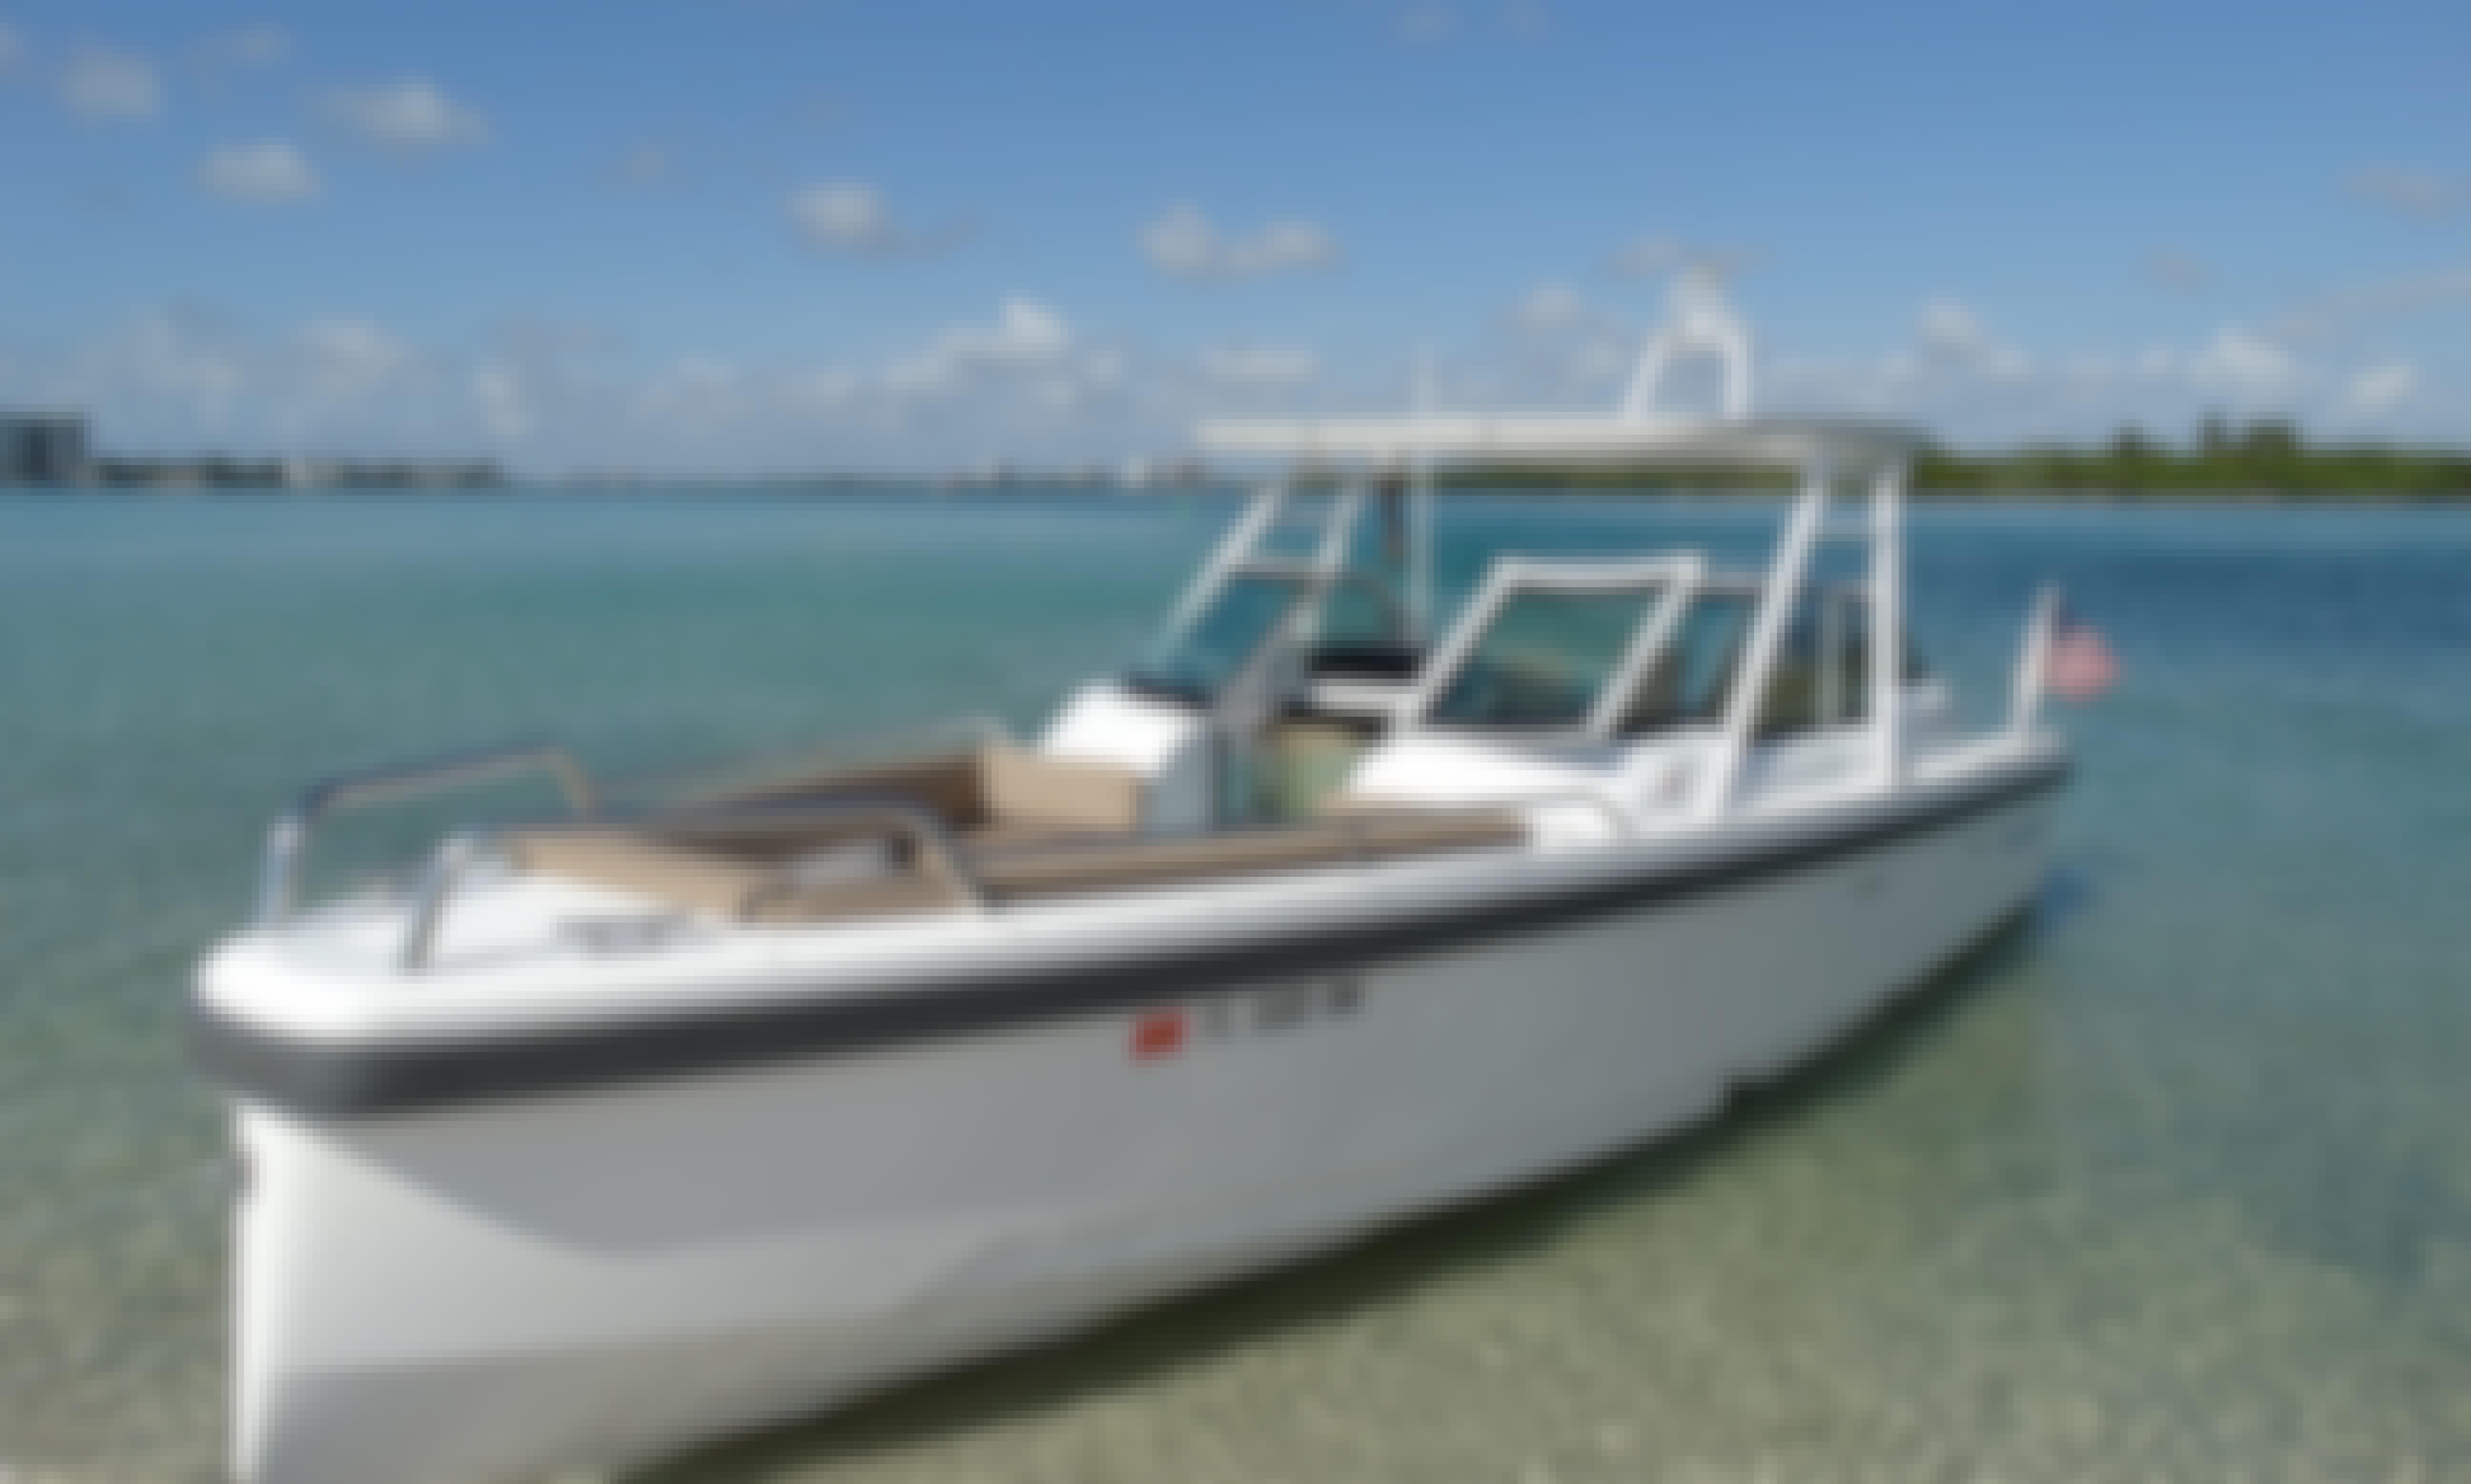 Luxury Sandbar and Sightseeing Aboard a 6-Person Axopar Walk Around Boat in Miami, Florida